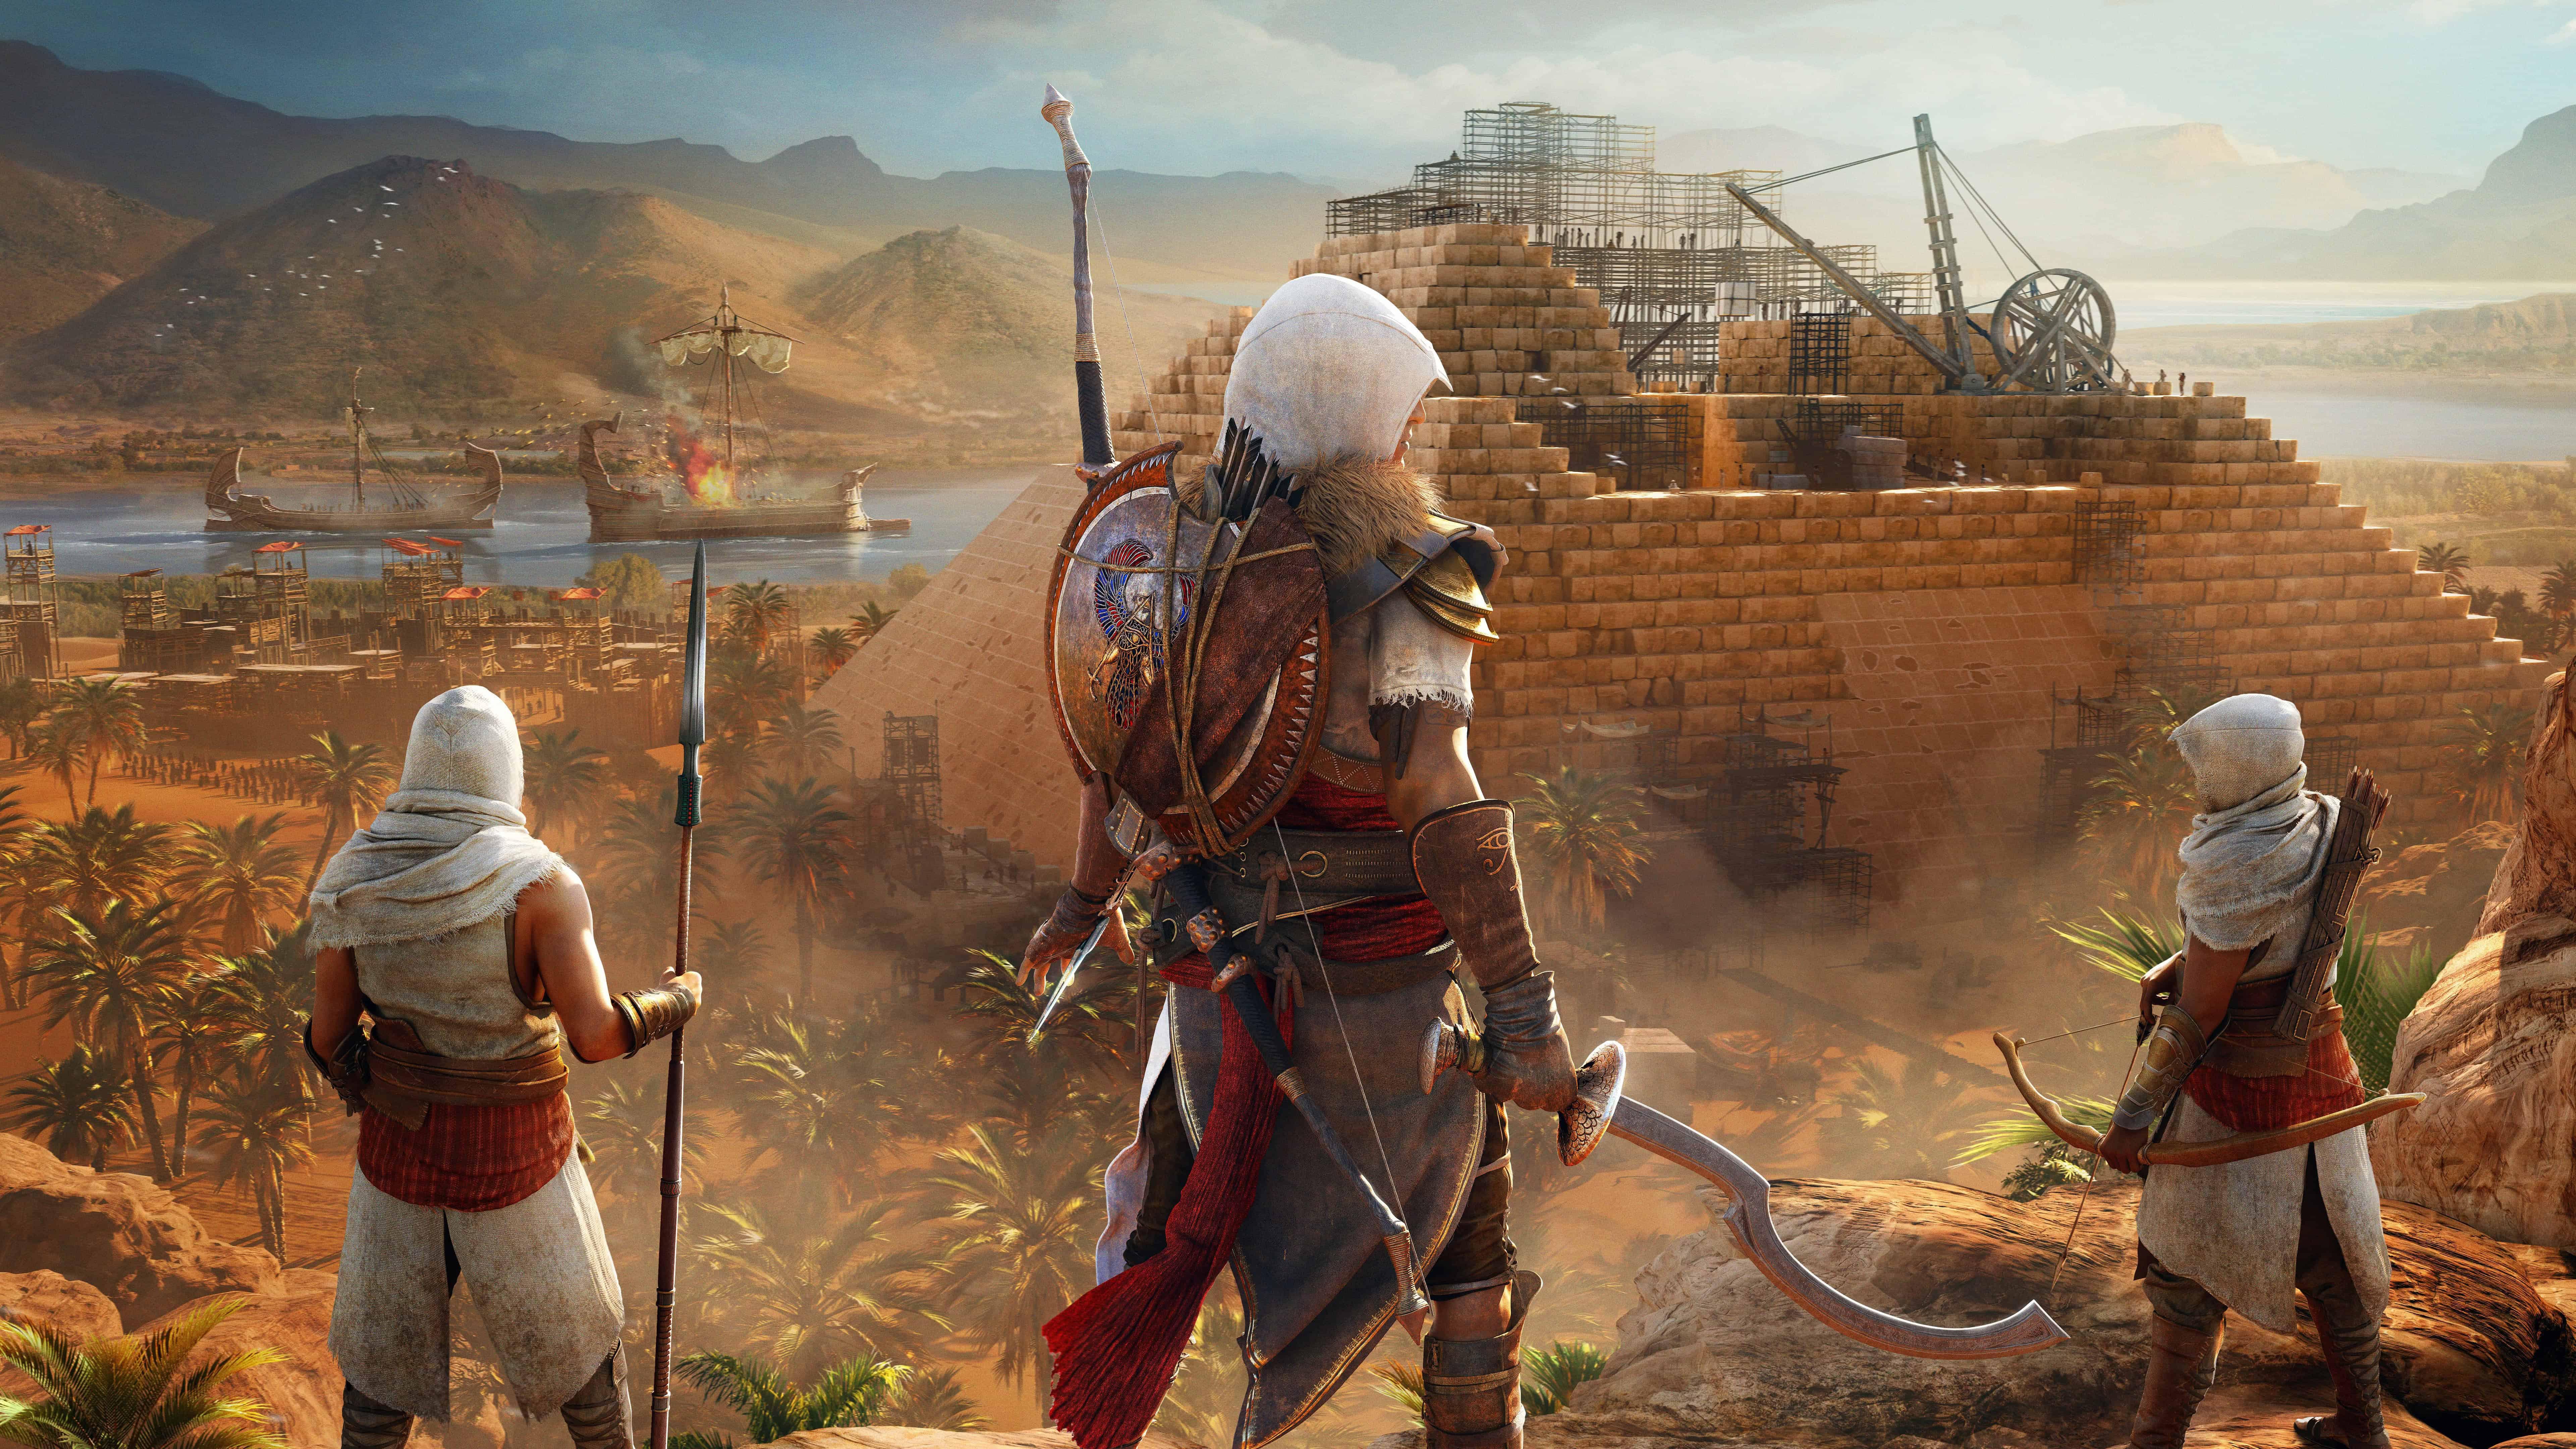 assassins creed origins the hidden ones dlc uhd 8k wallpaper